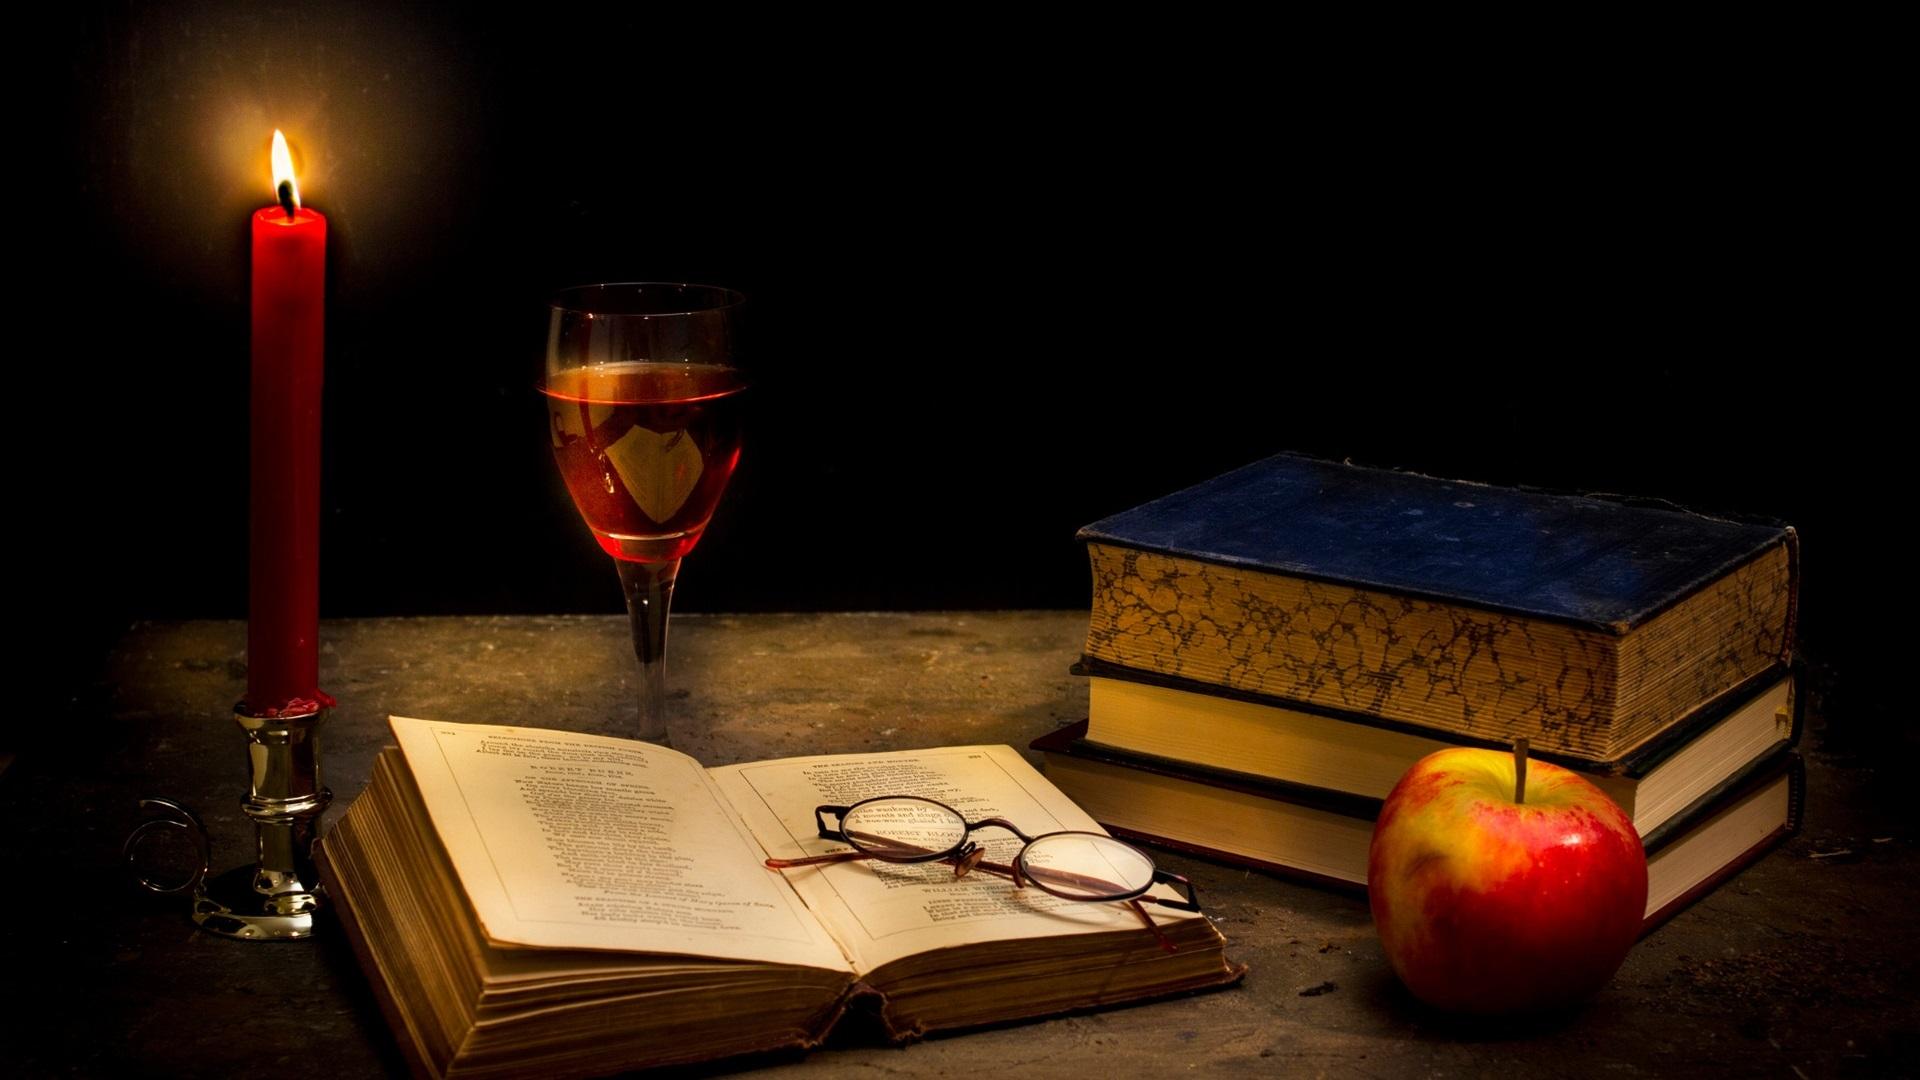 wallpaper tranquillity dark, candle, books, glass, apple 1920x1200